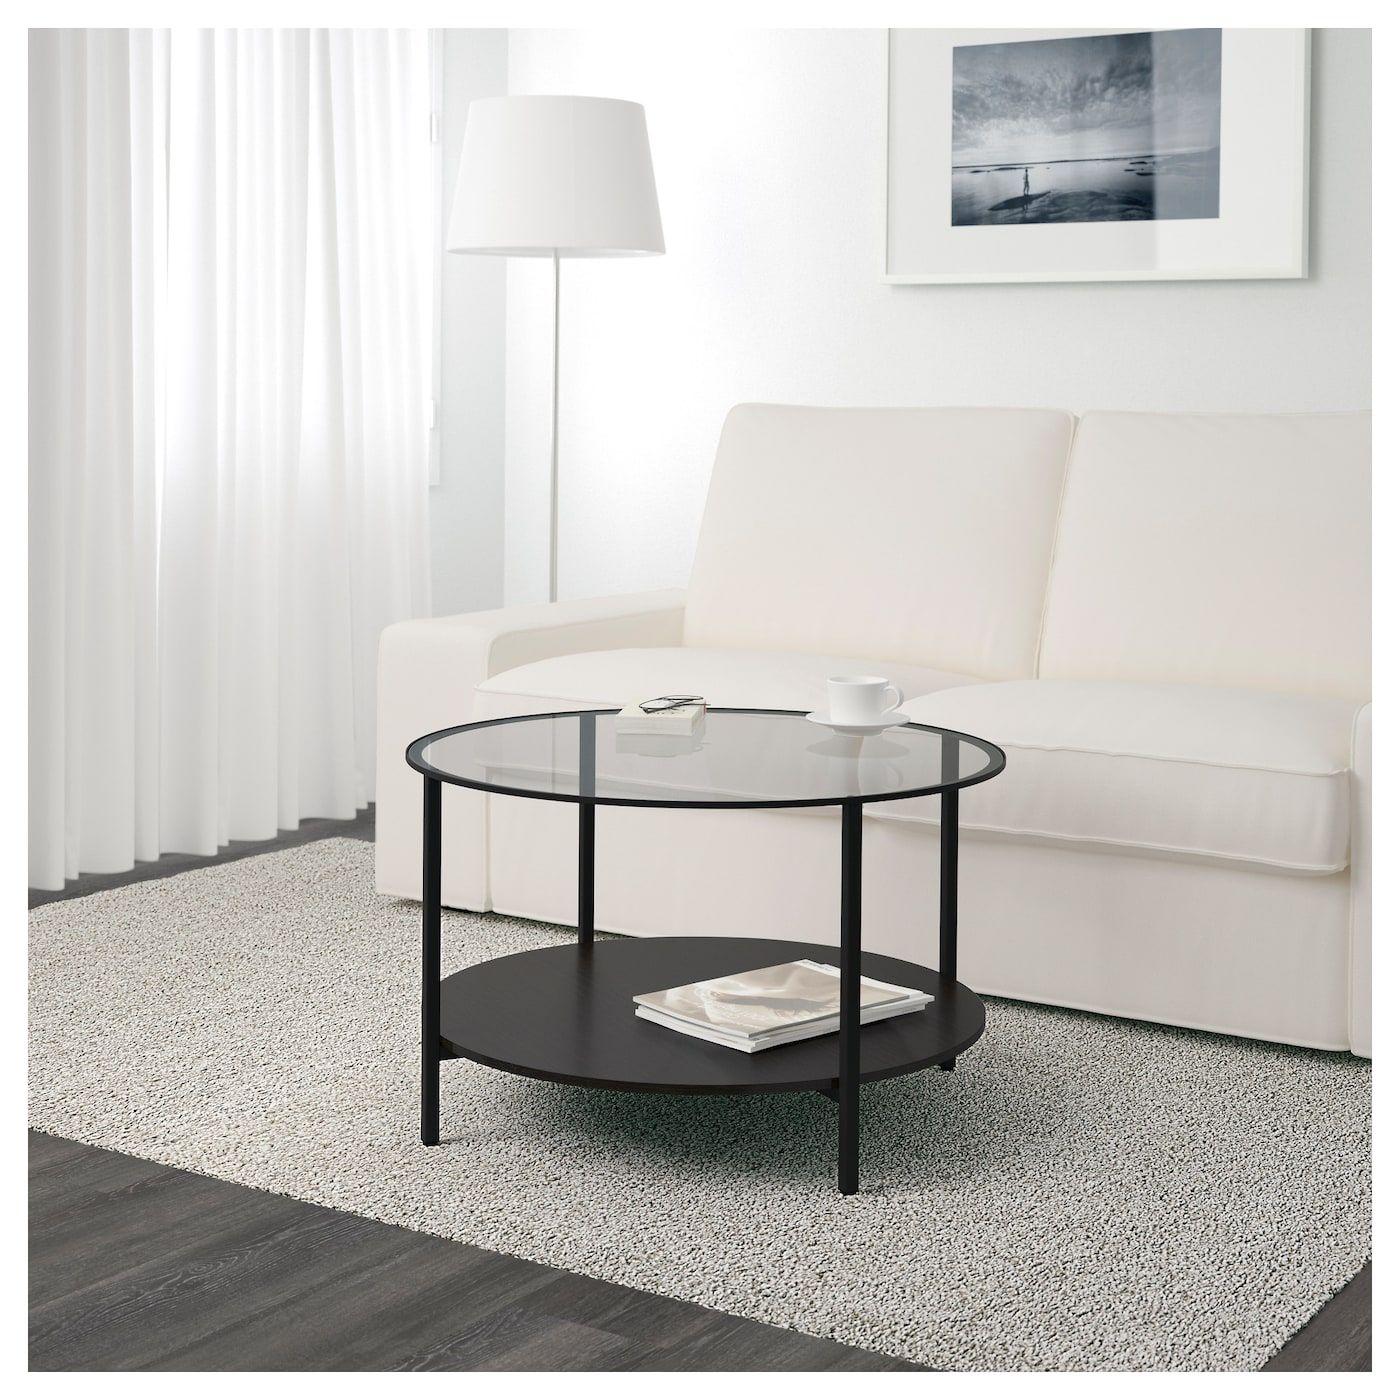 Ikea Vittsjo Black Brown Glass Coffee Table In 2019 Maple